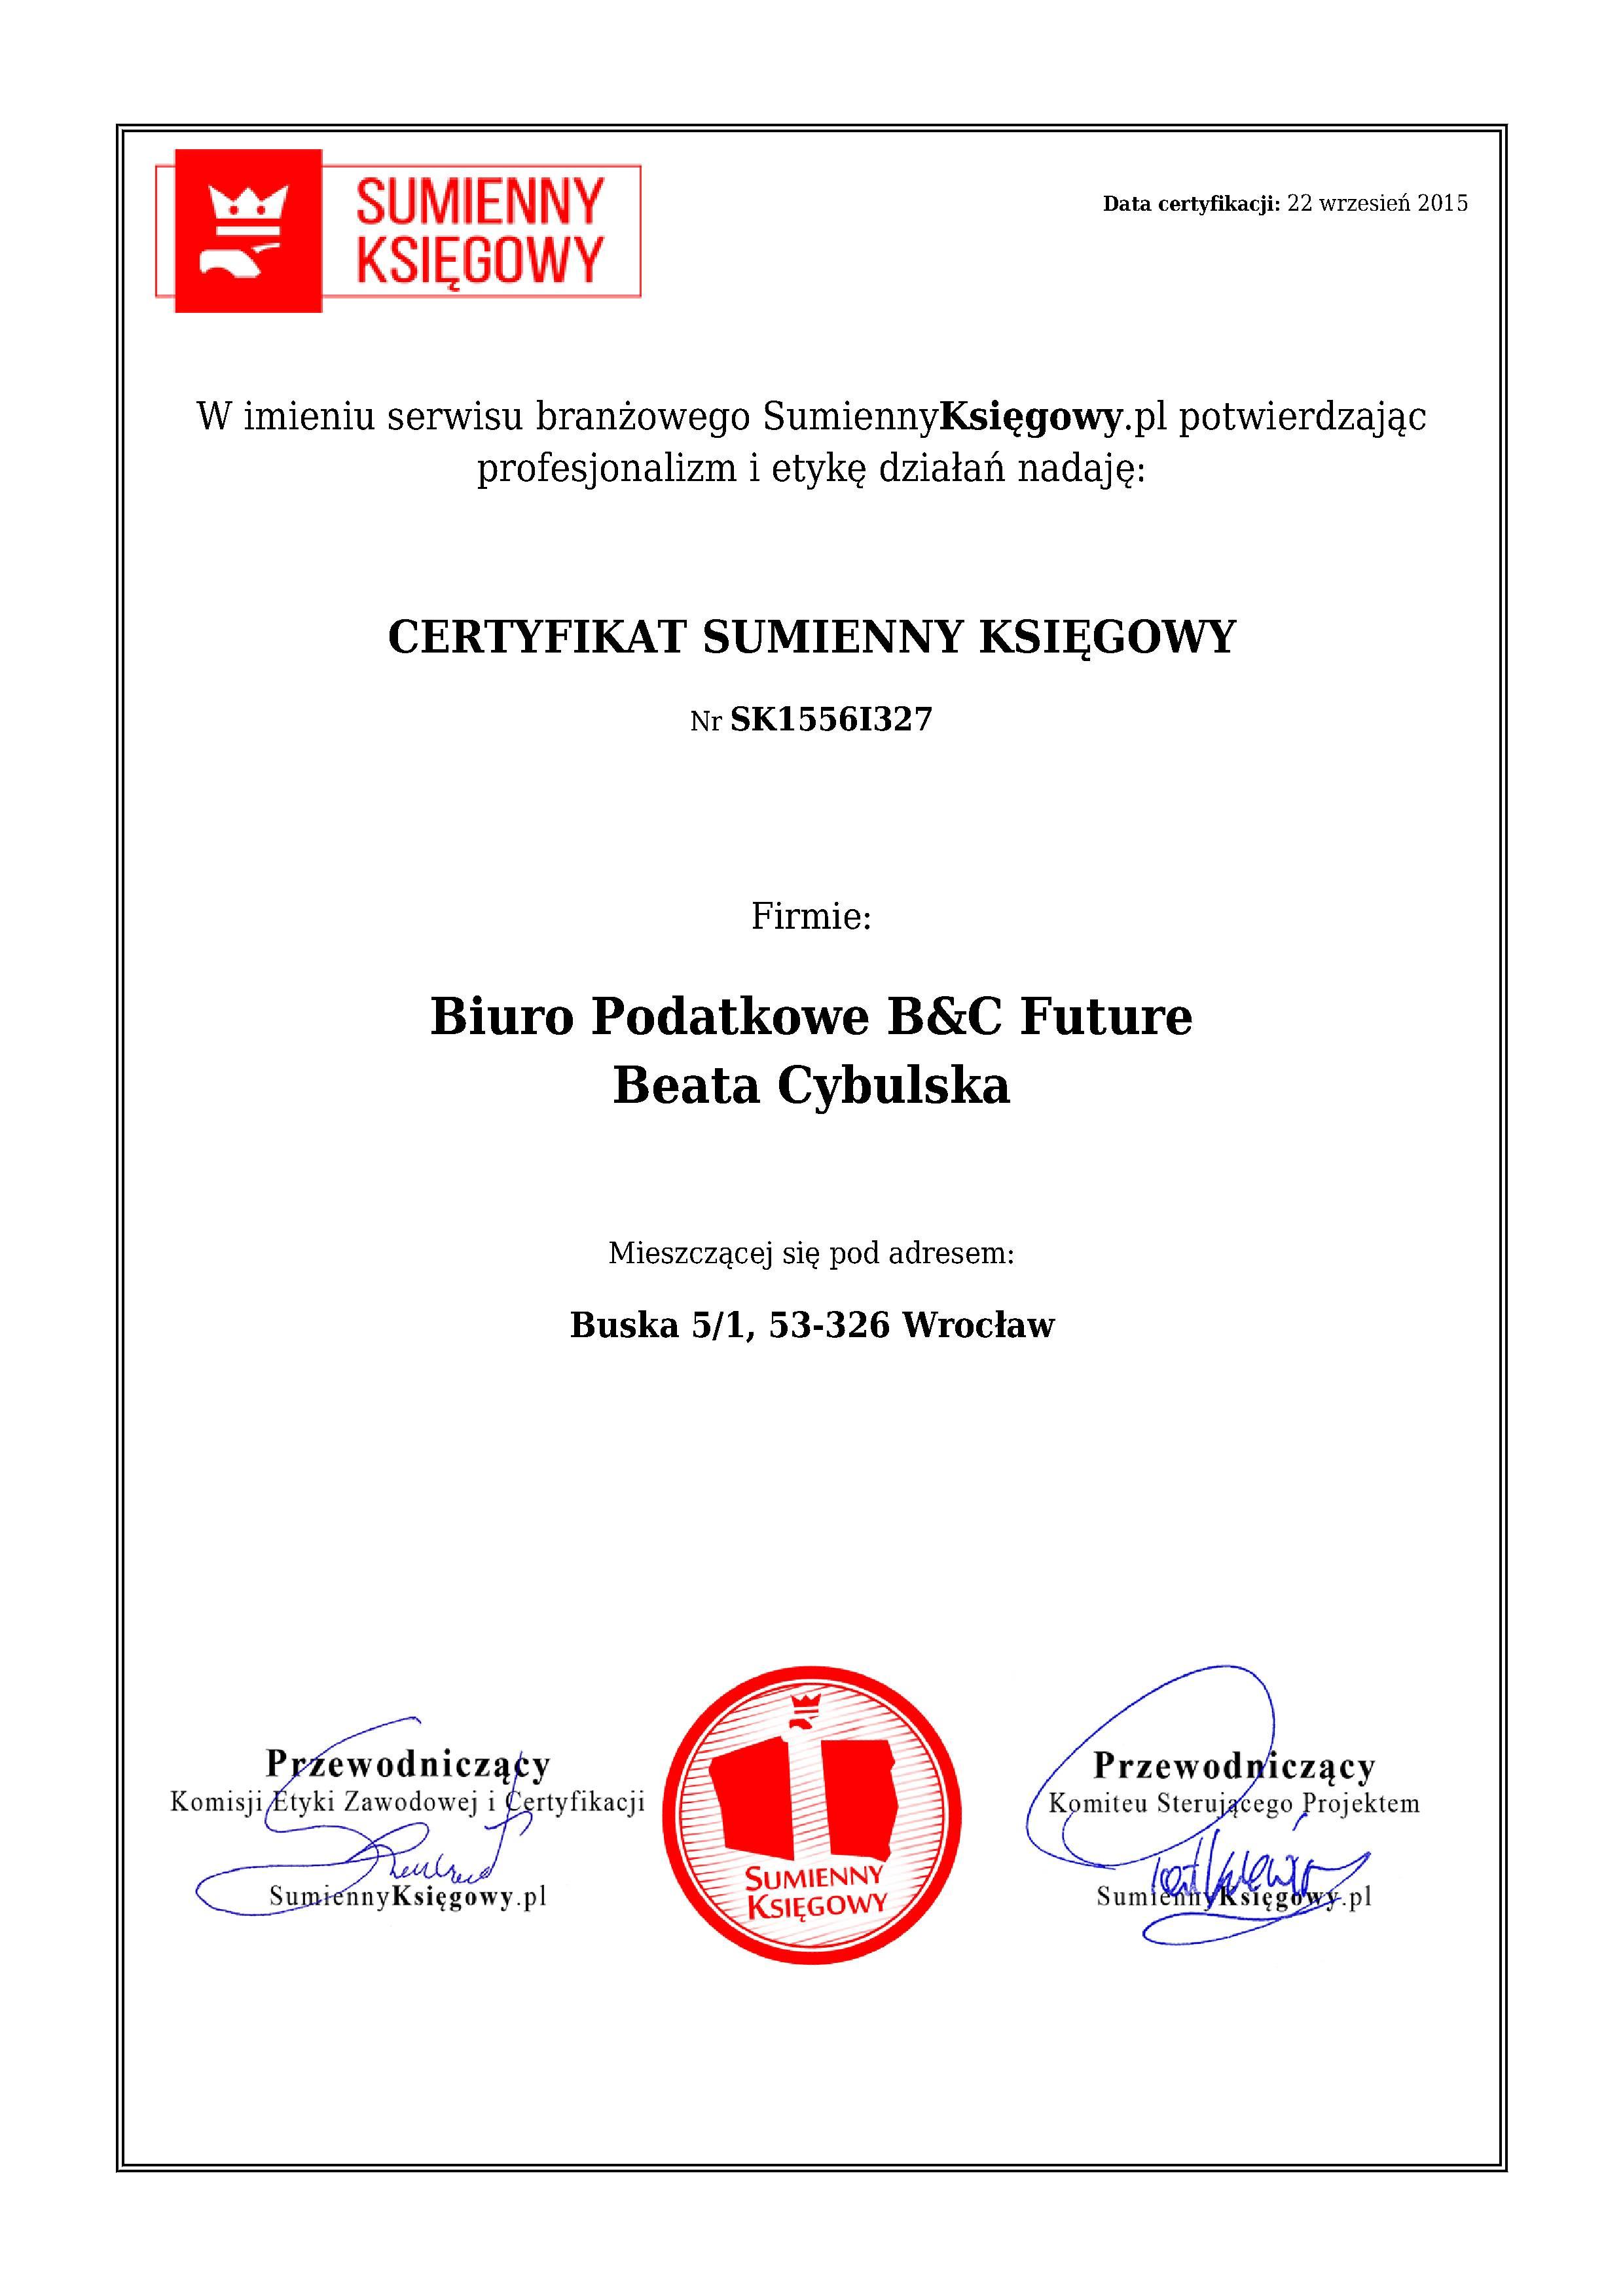 Certyfikat Biuro Podatkowe B&C Future Beata Cybulska